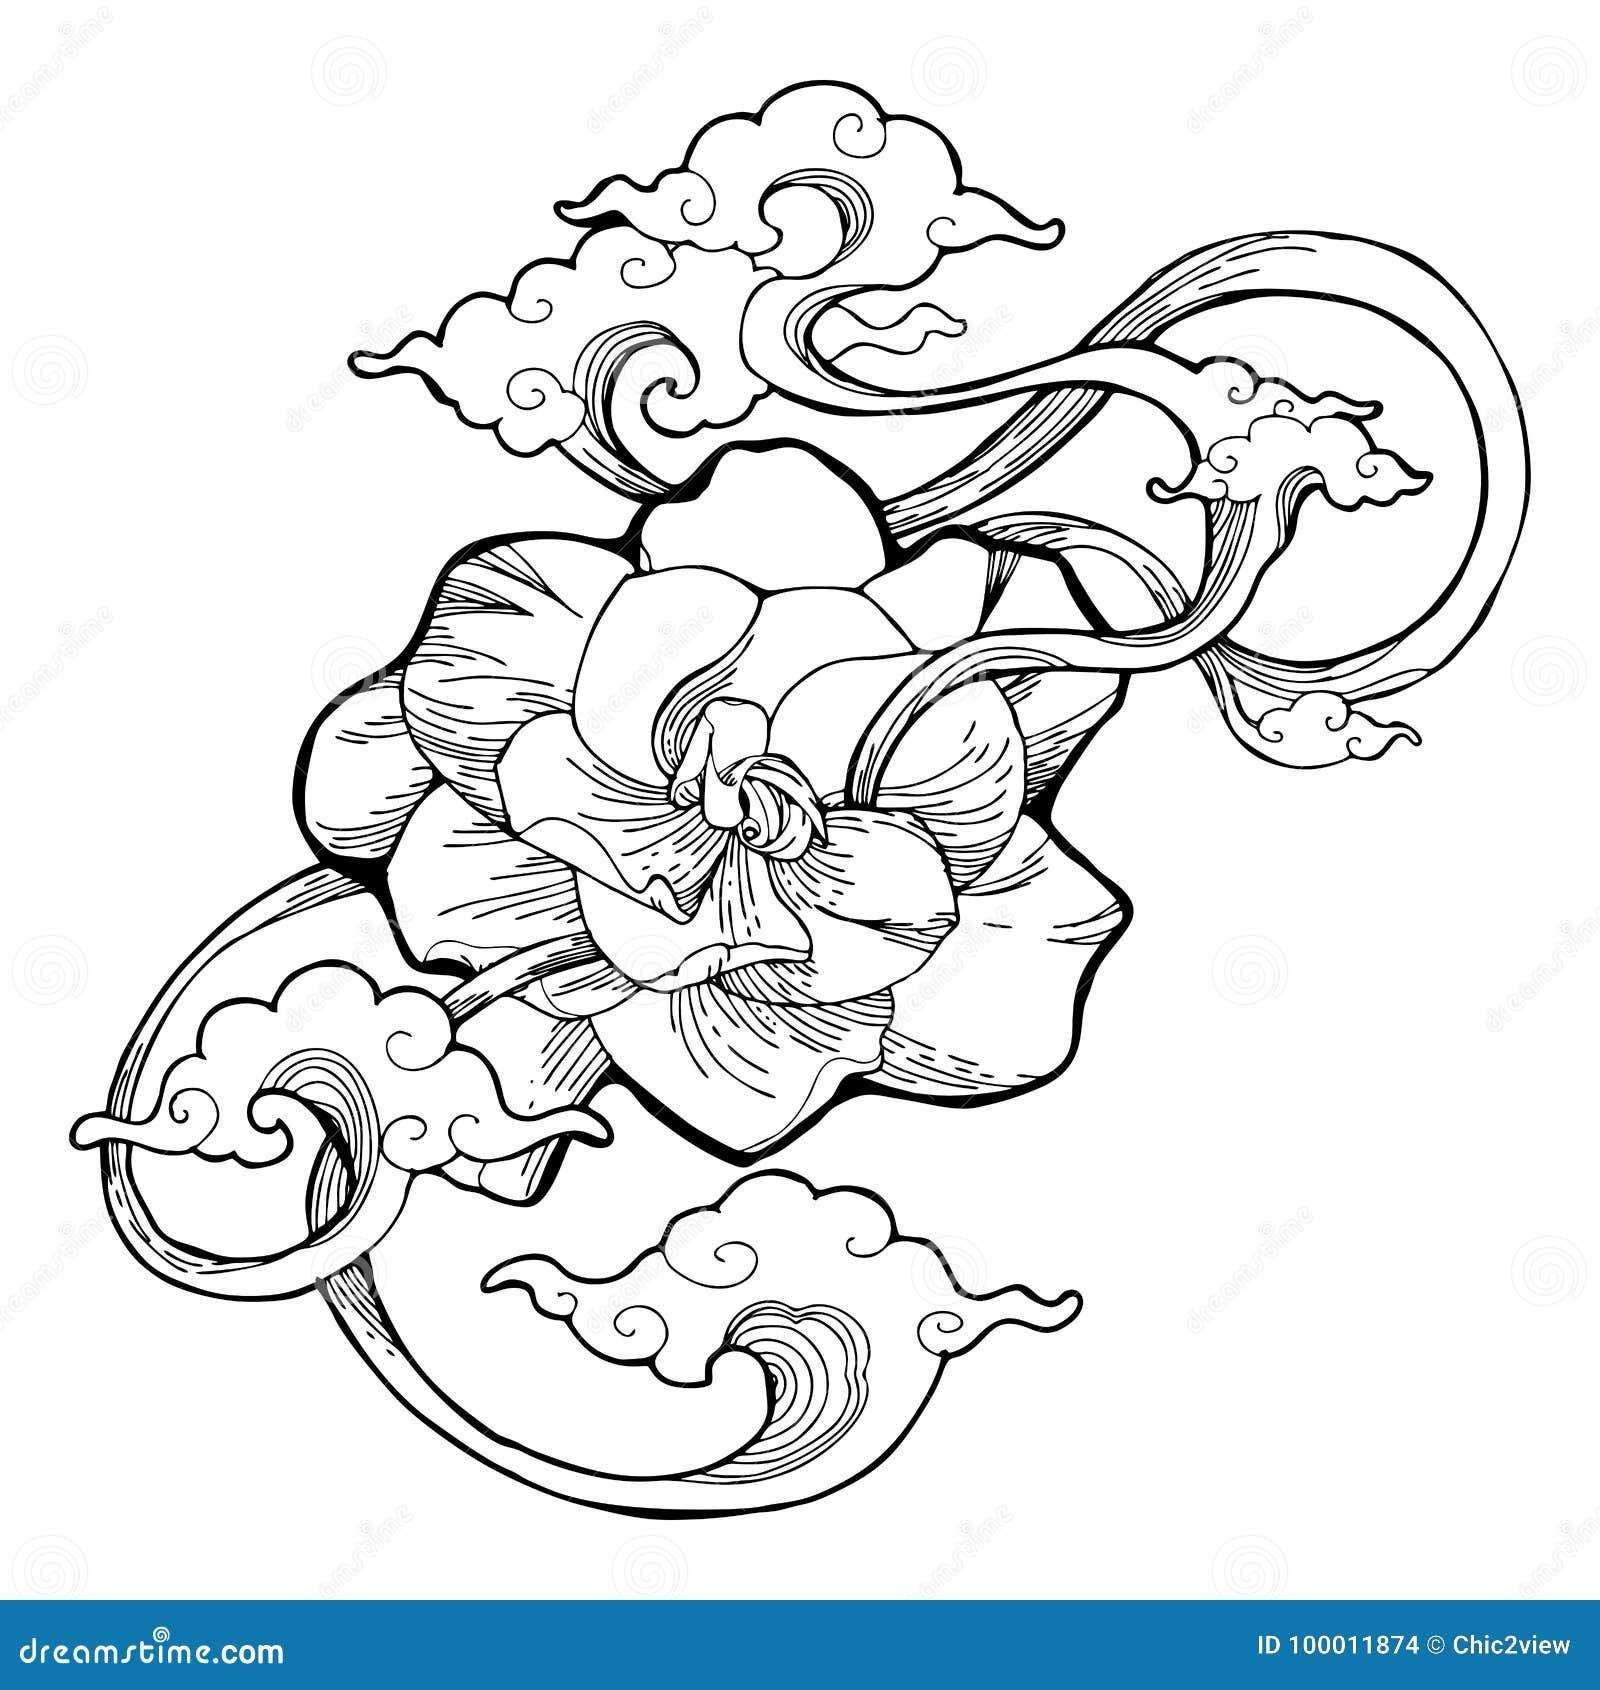 Cape jasmine gardenia jasmine and aroma cloud design by ink drawing cape jasmine gardenia jasmine and aroma cloud design by ink drawing tattoo with white isolated background izmirmasajfo Images